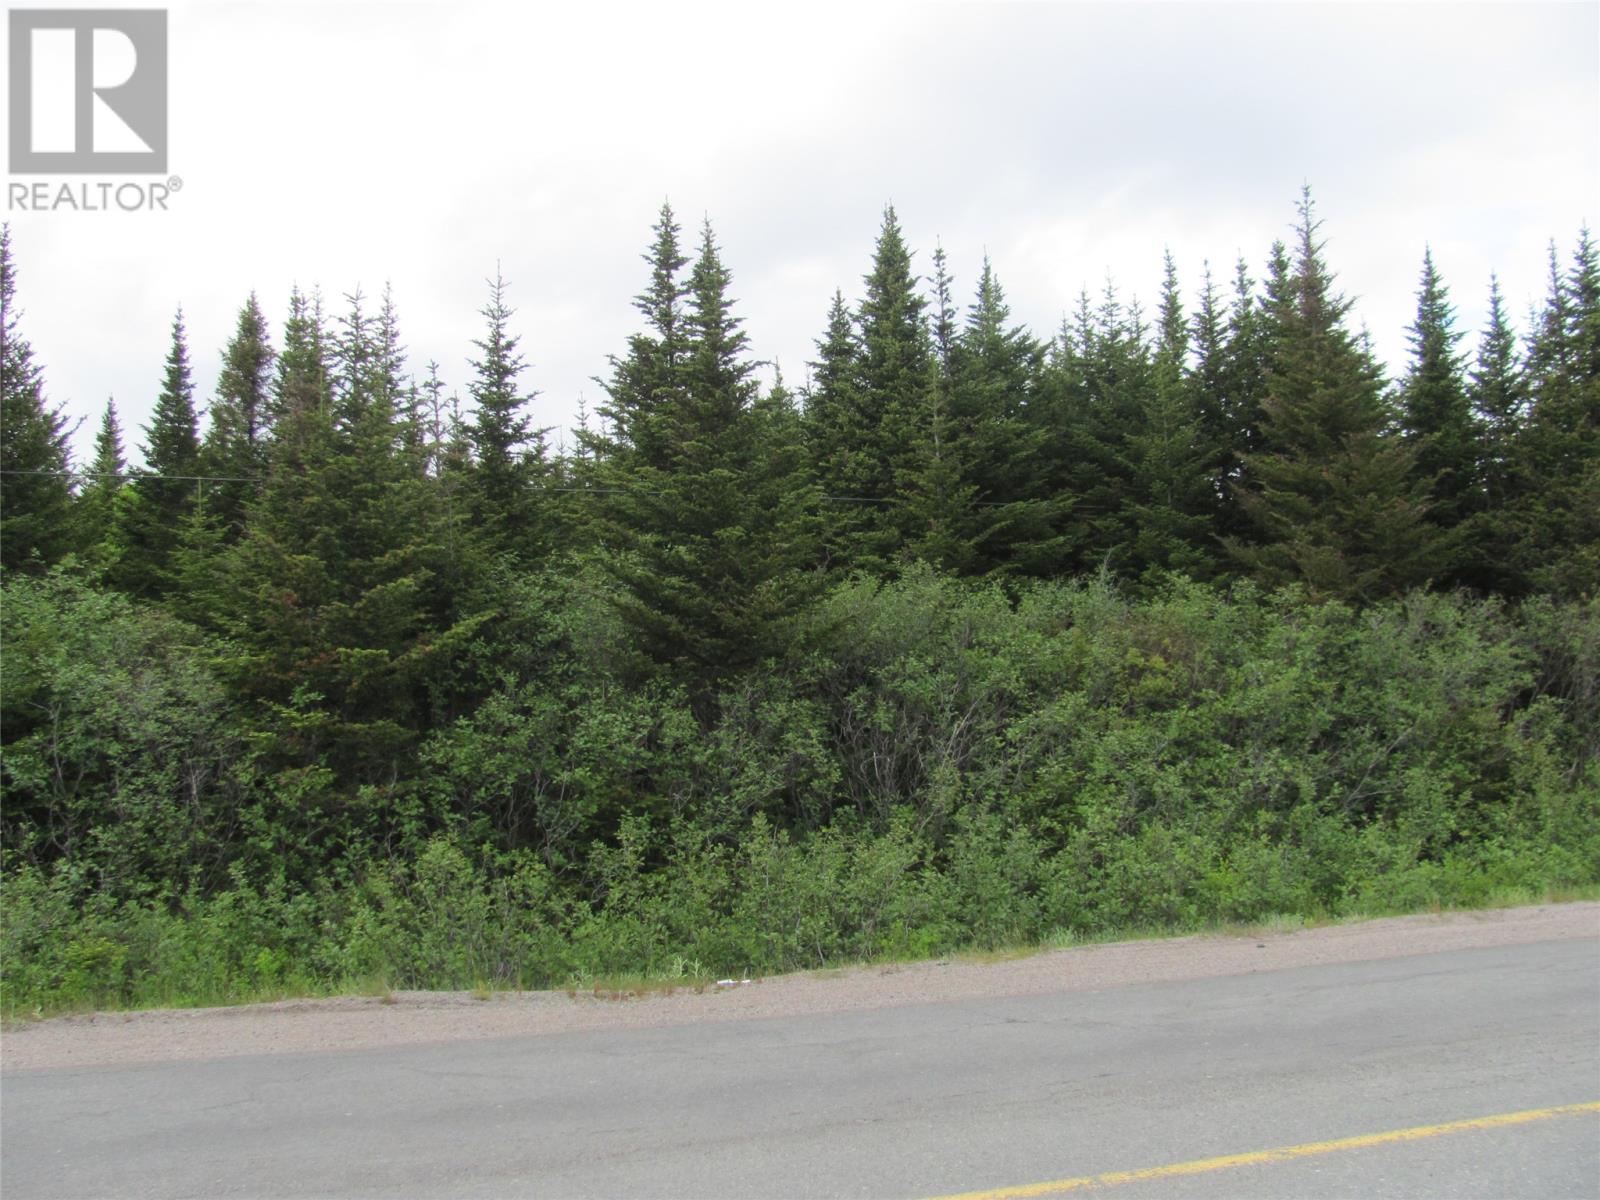 301-307 John Cabot Drive, Bonavista, Newfoundland & Labrador  A0C 1B0 - Photo 2 - 1198494